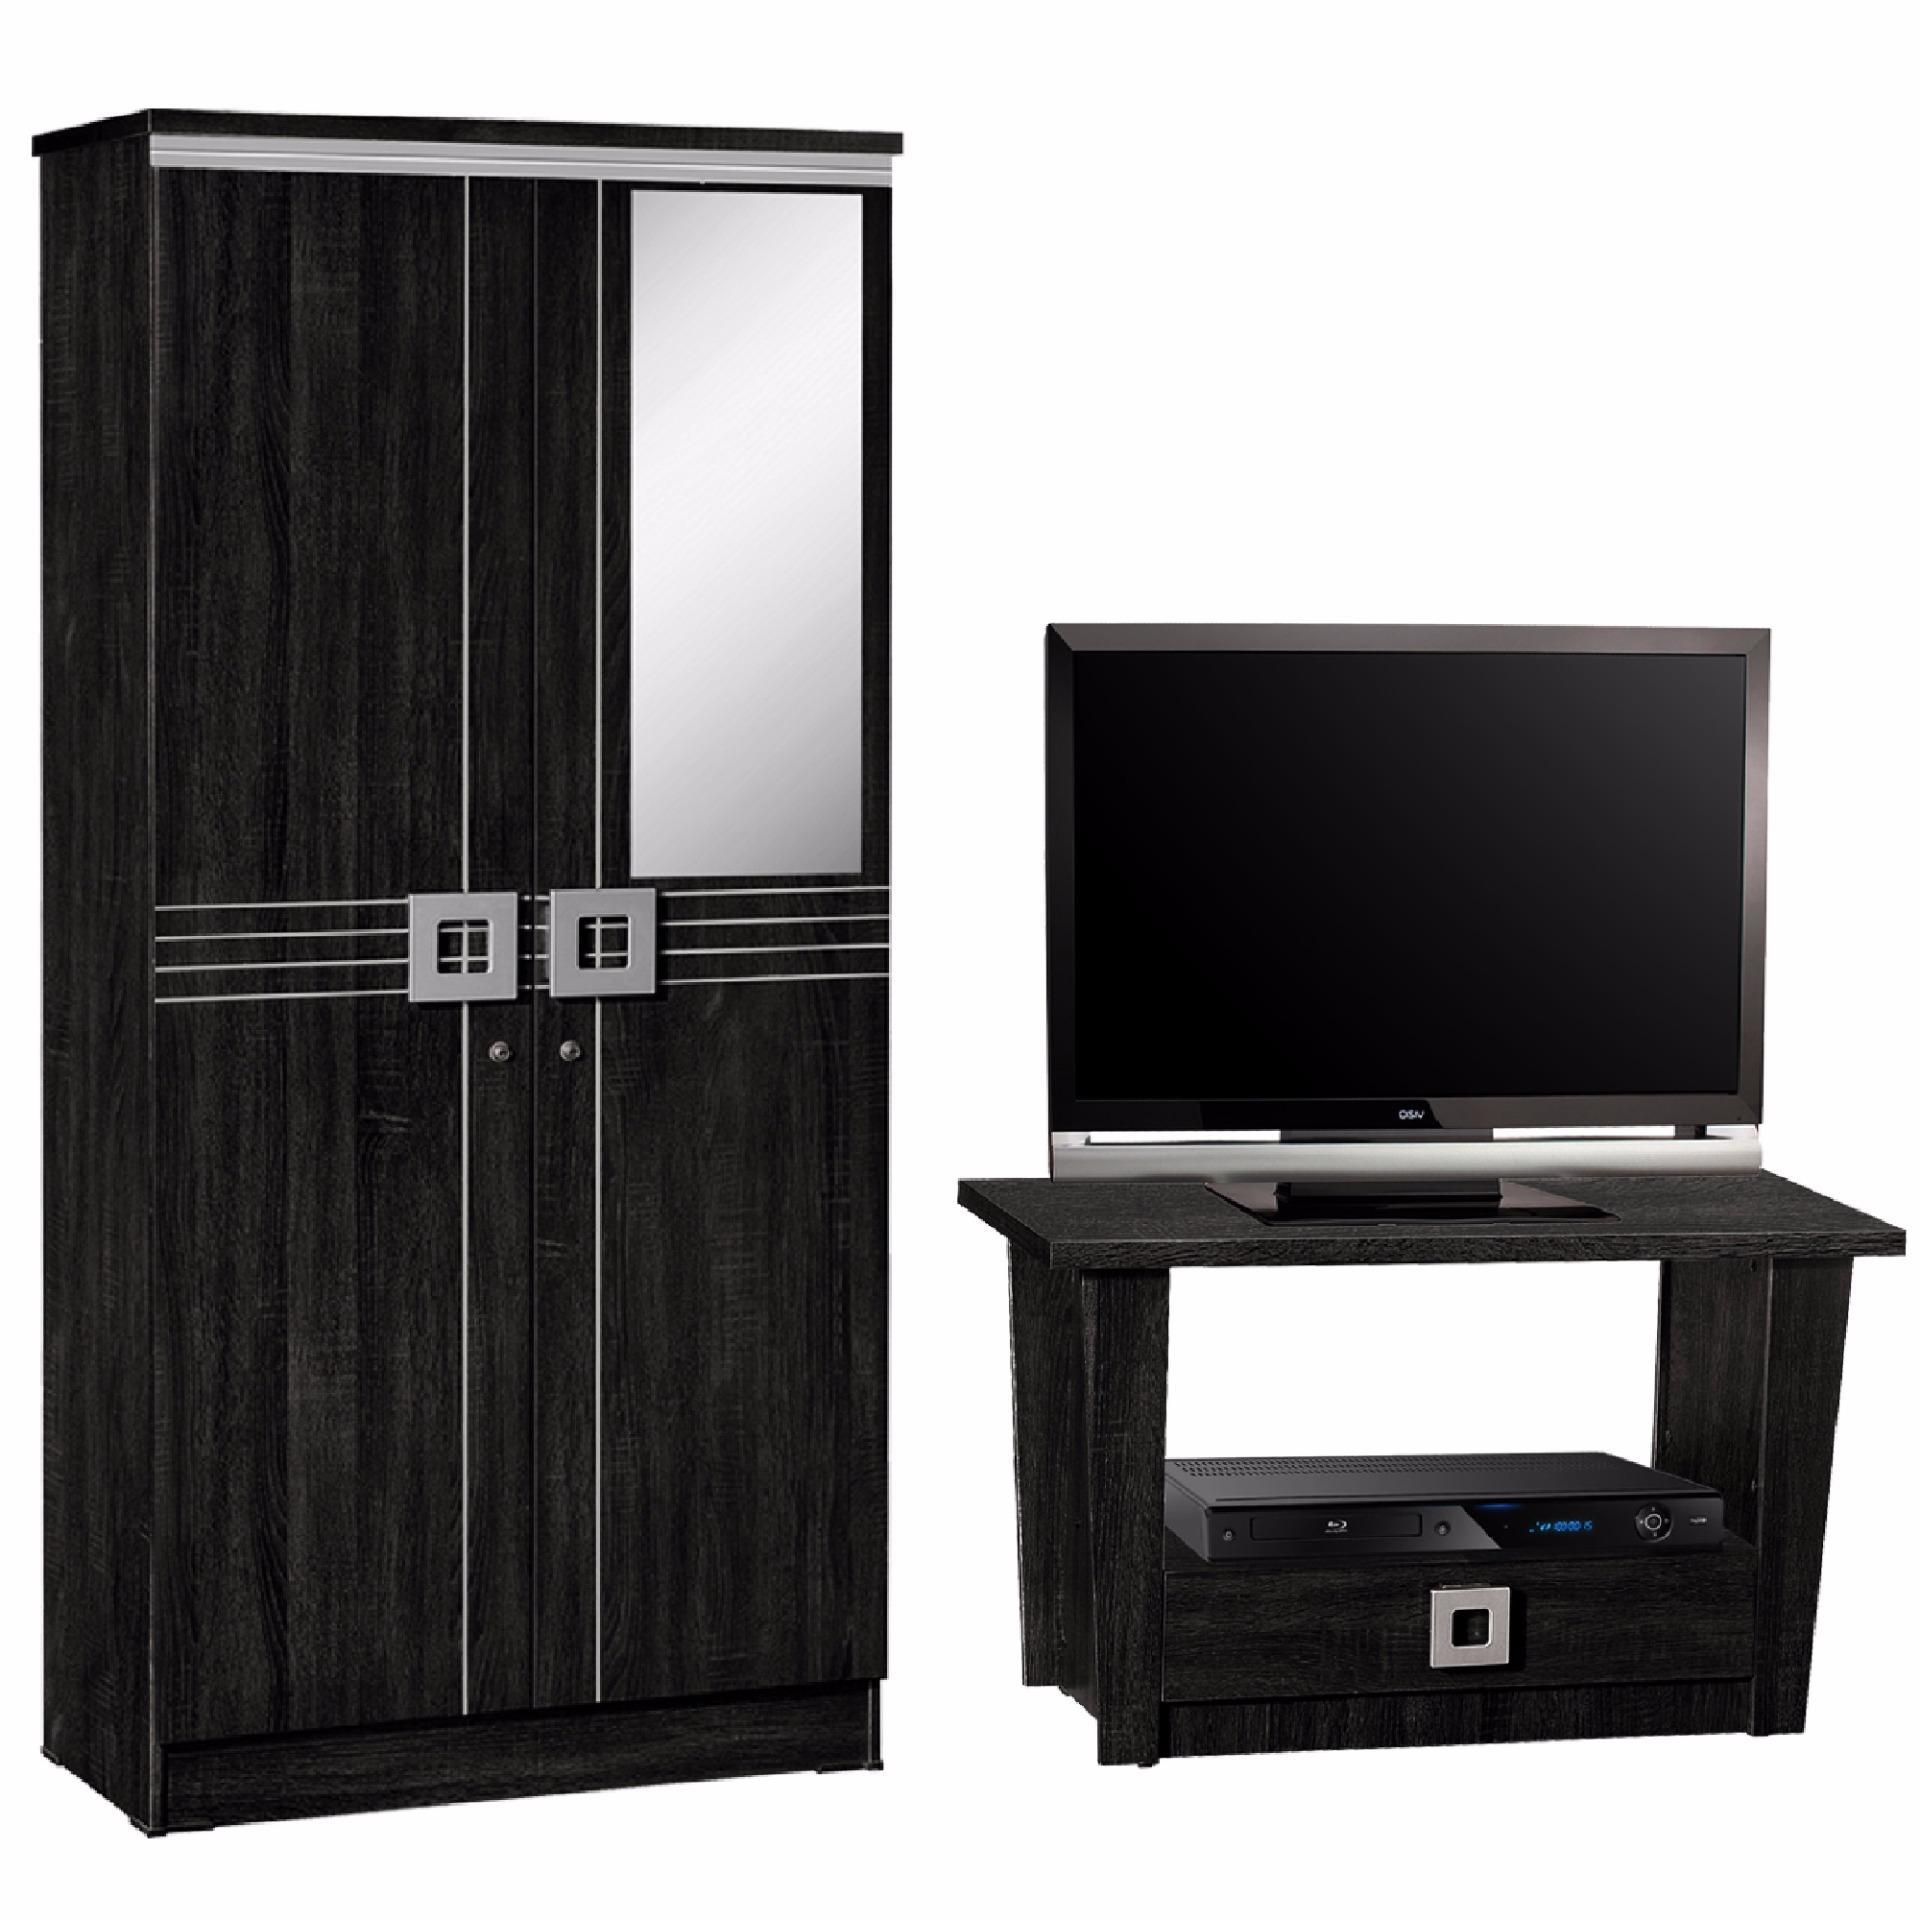 Lemari Pakaian dan Rak TV (Paket Mini)